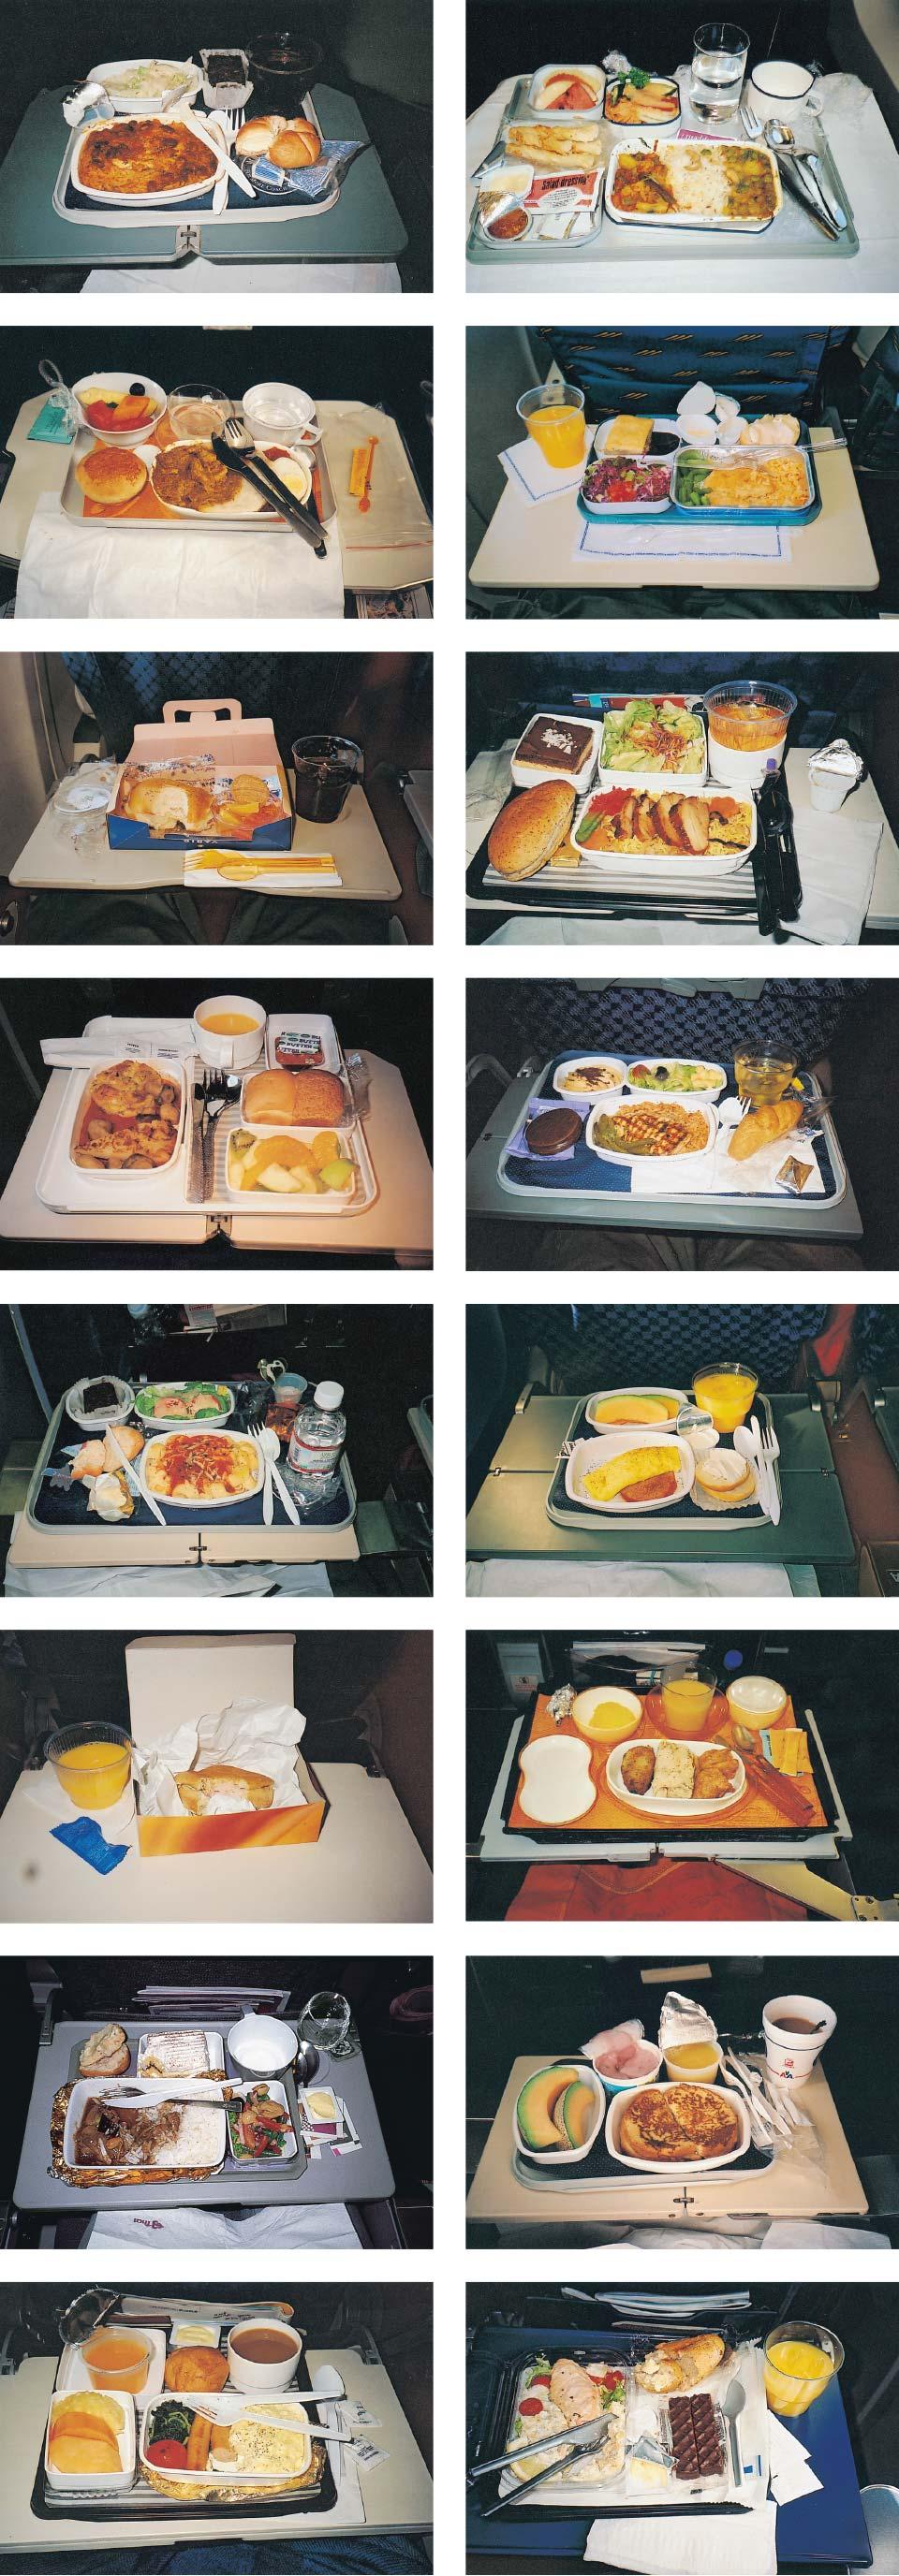 AirlineMeals_960_01.jpg